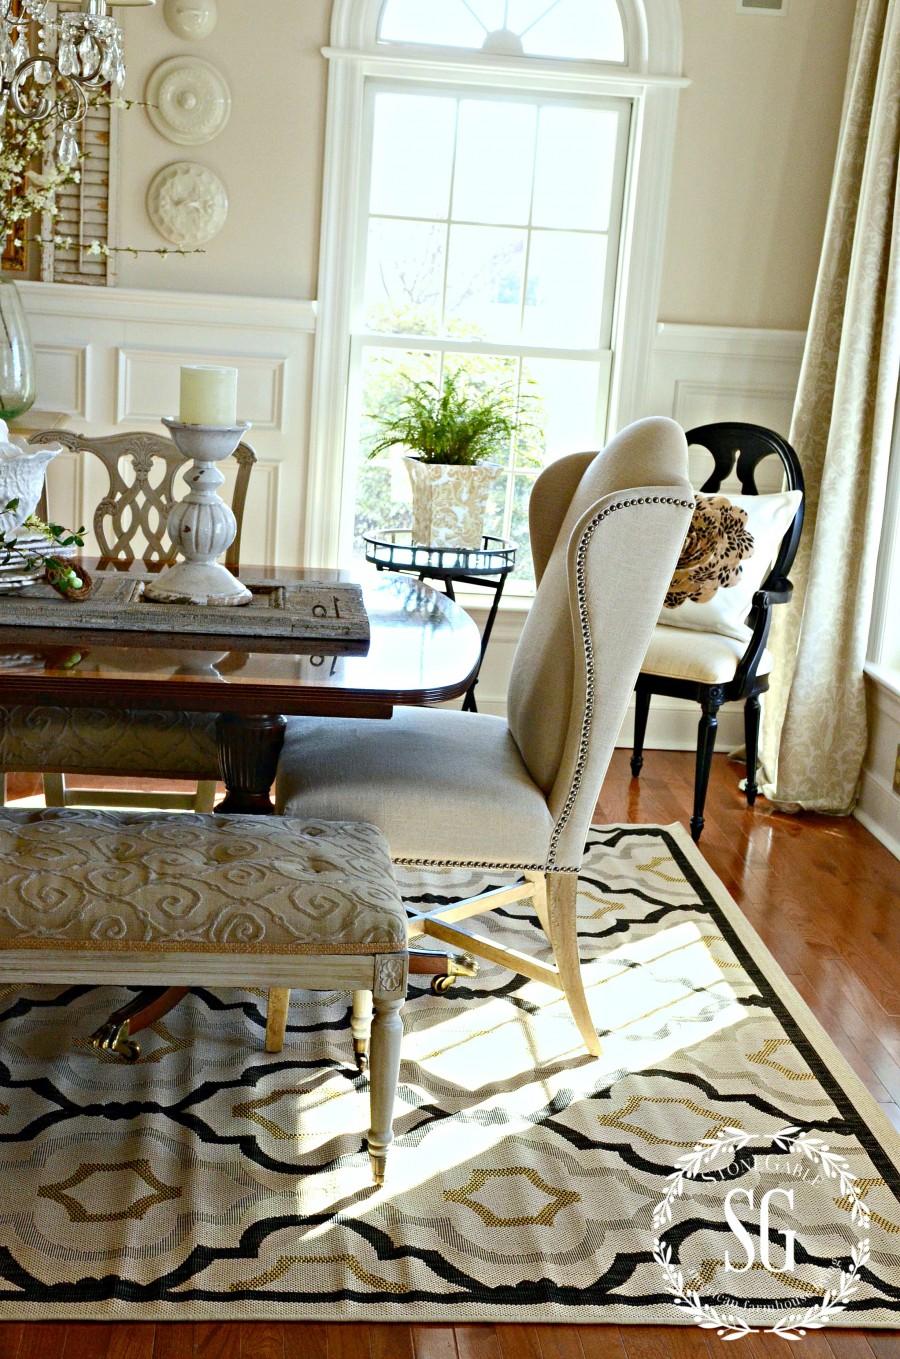 new dining room rug stonegable. Black Bedroom Furniture Sets. Home Design Ideas